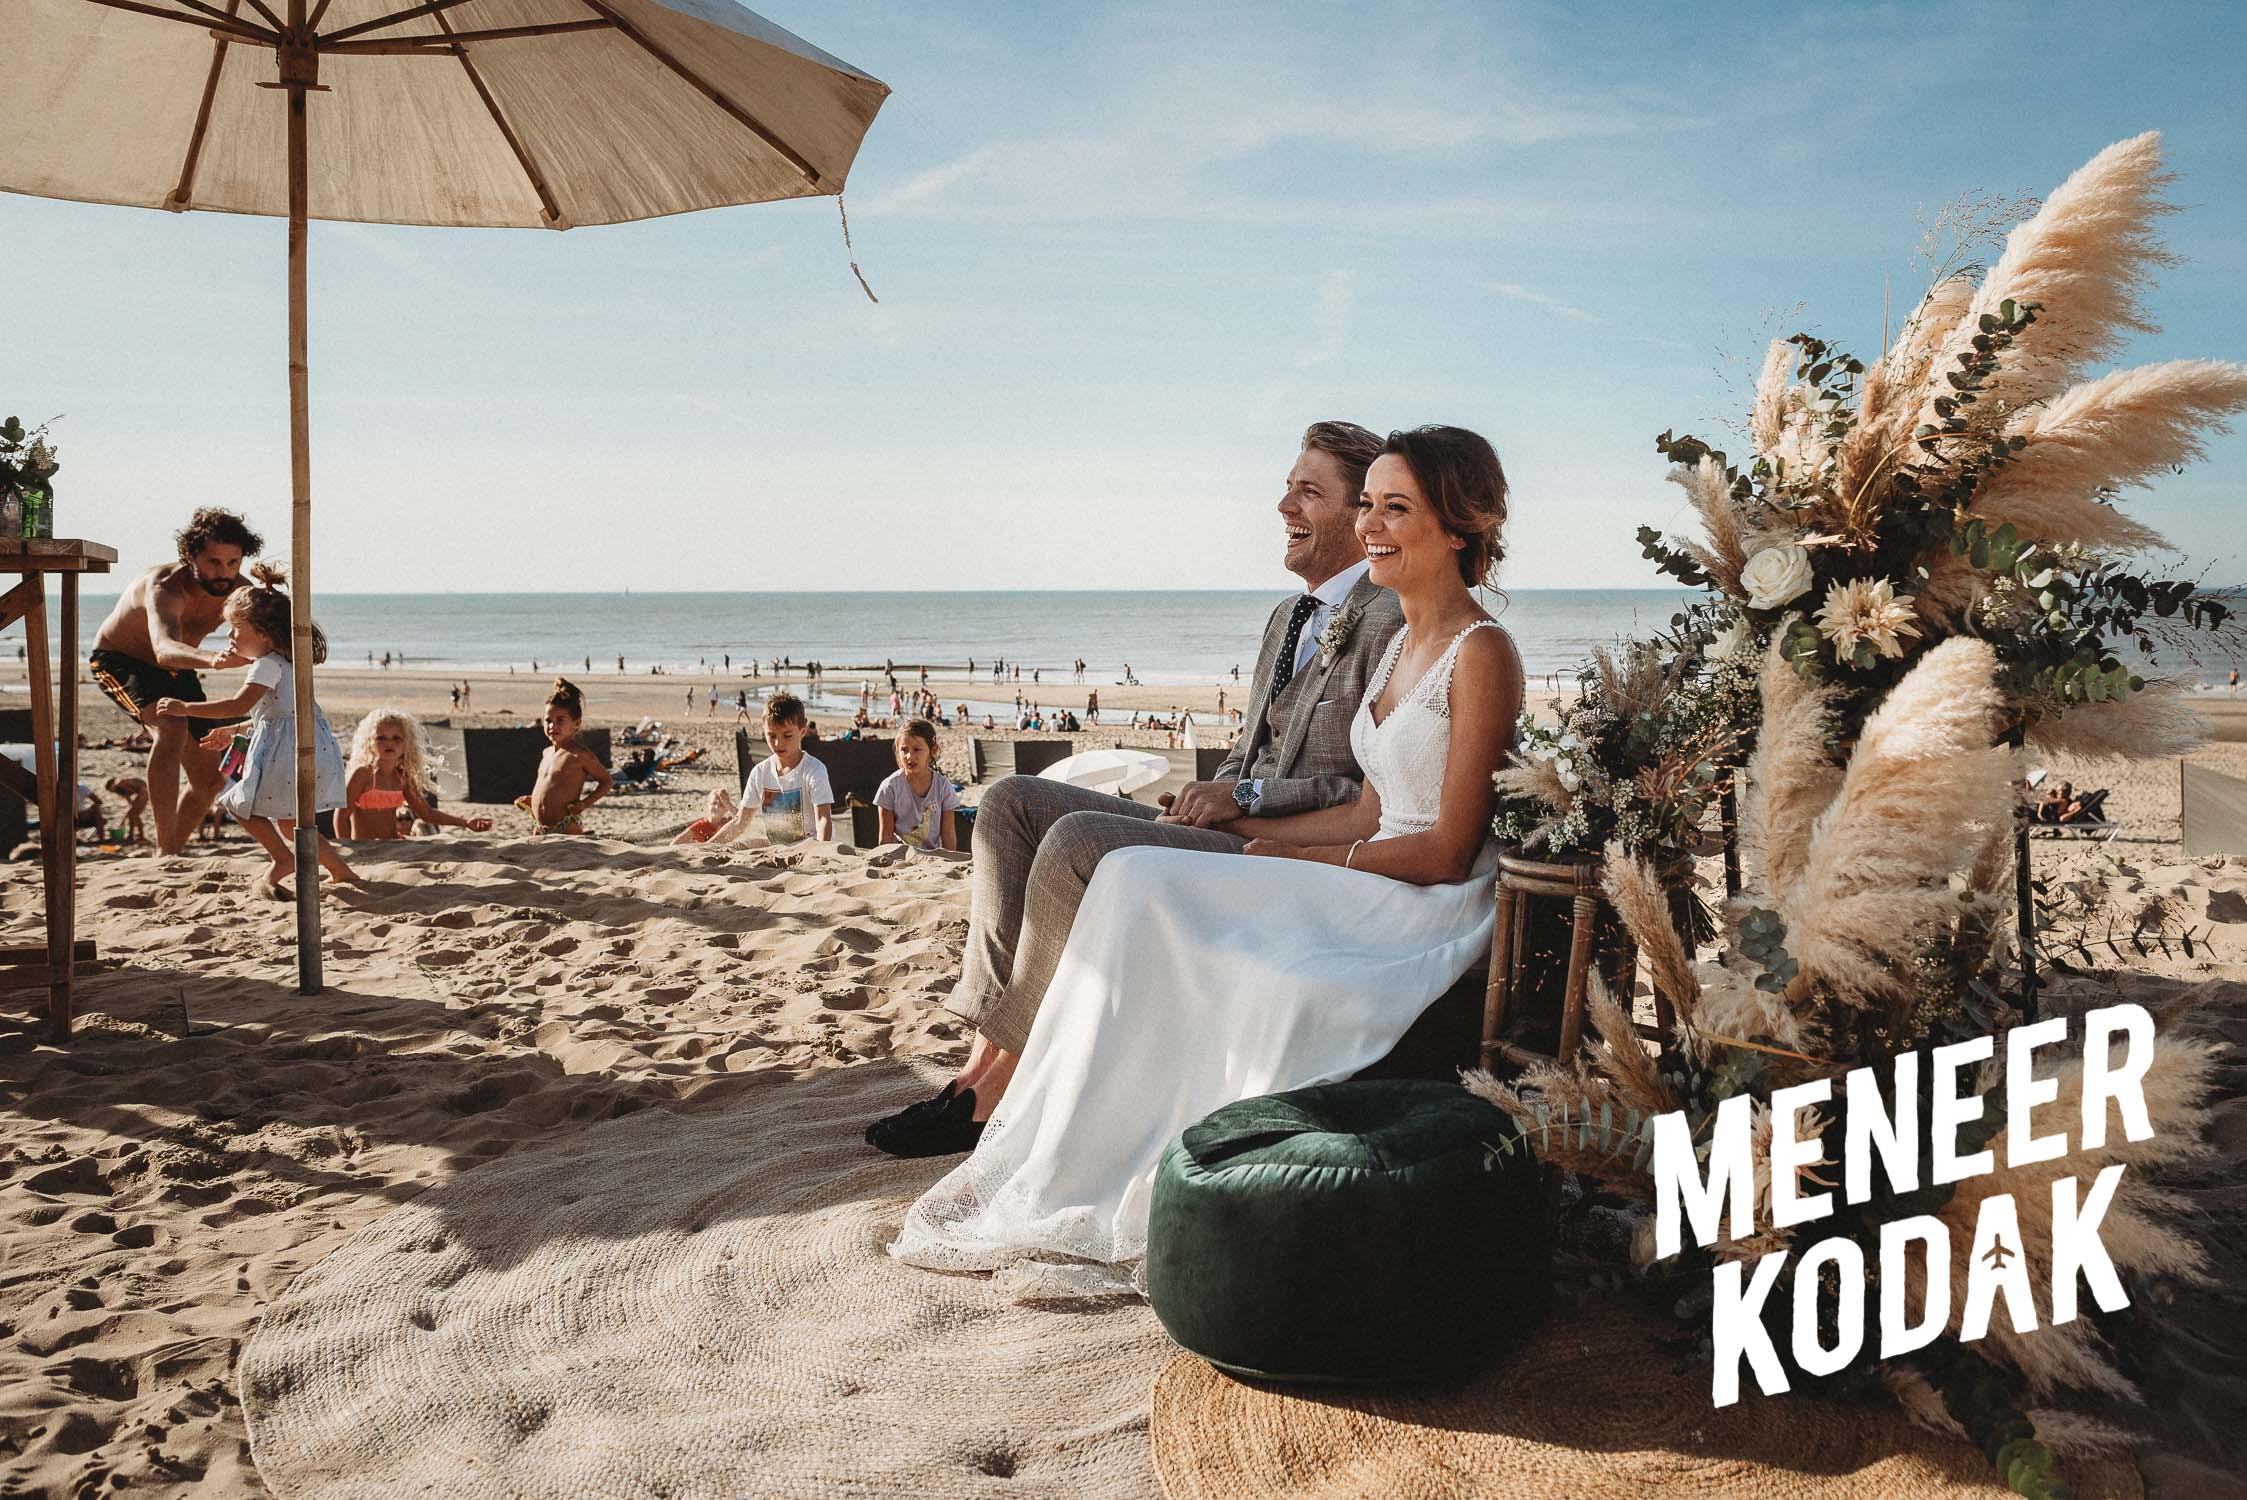 Meneer Kodak - Strandbruiloft - Noordwijk - K&A-086.jpg